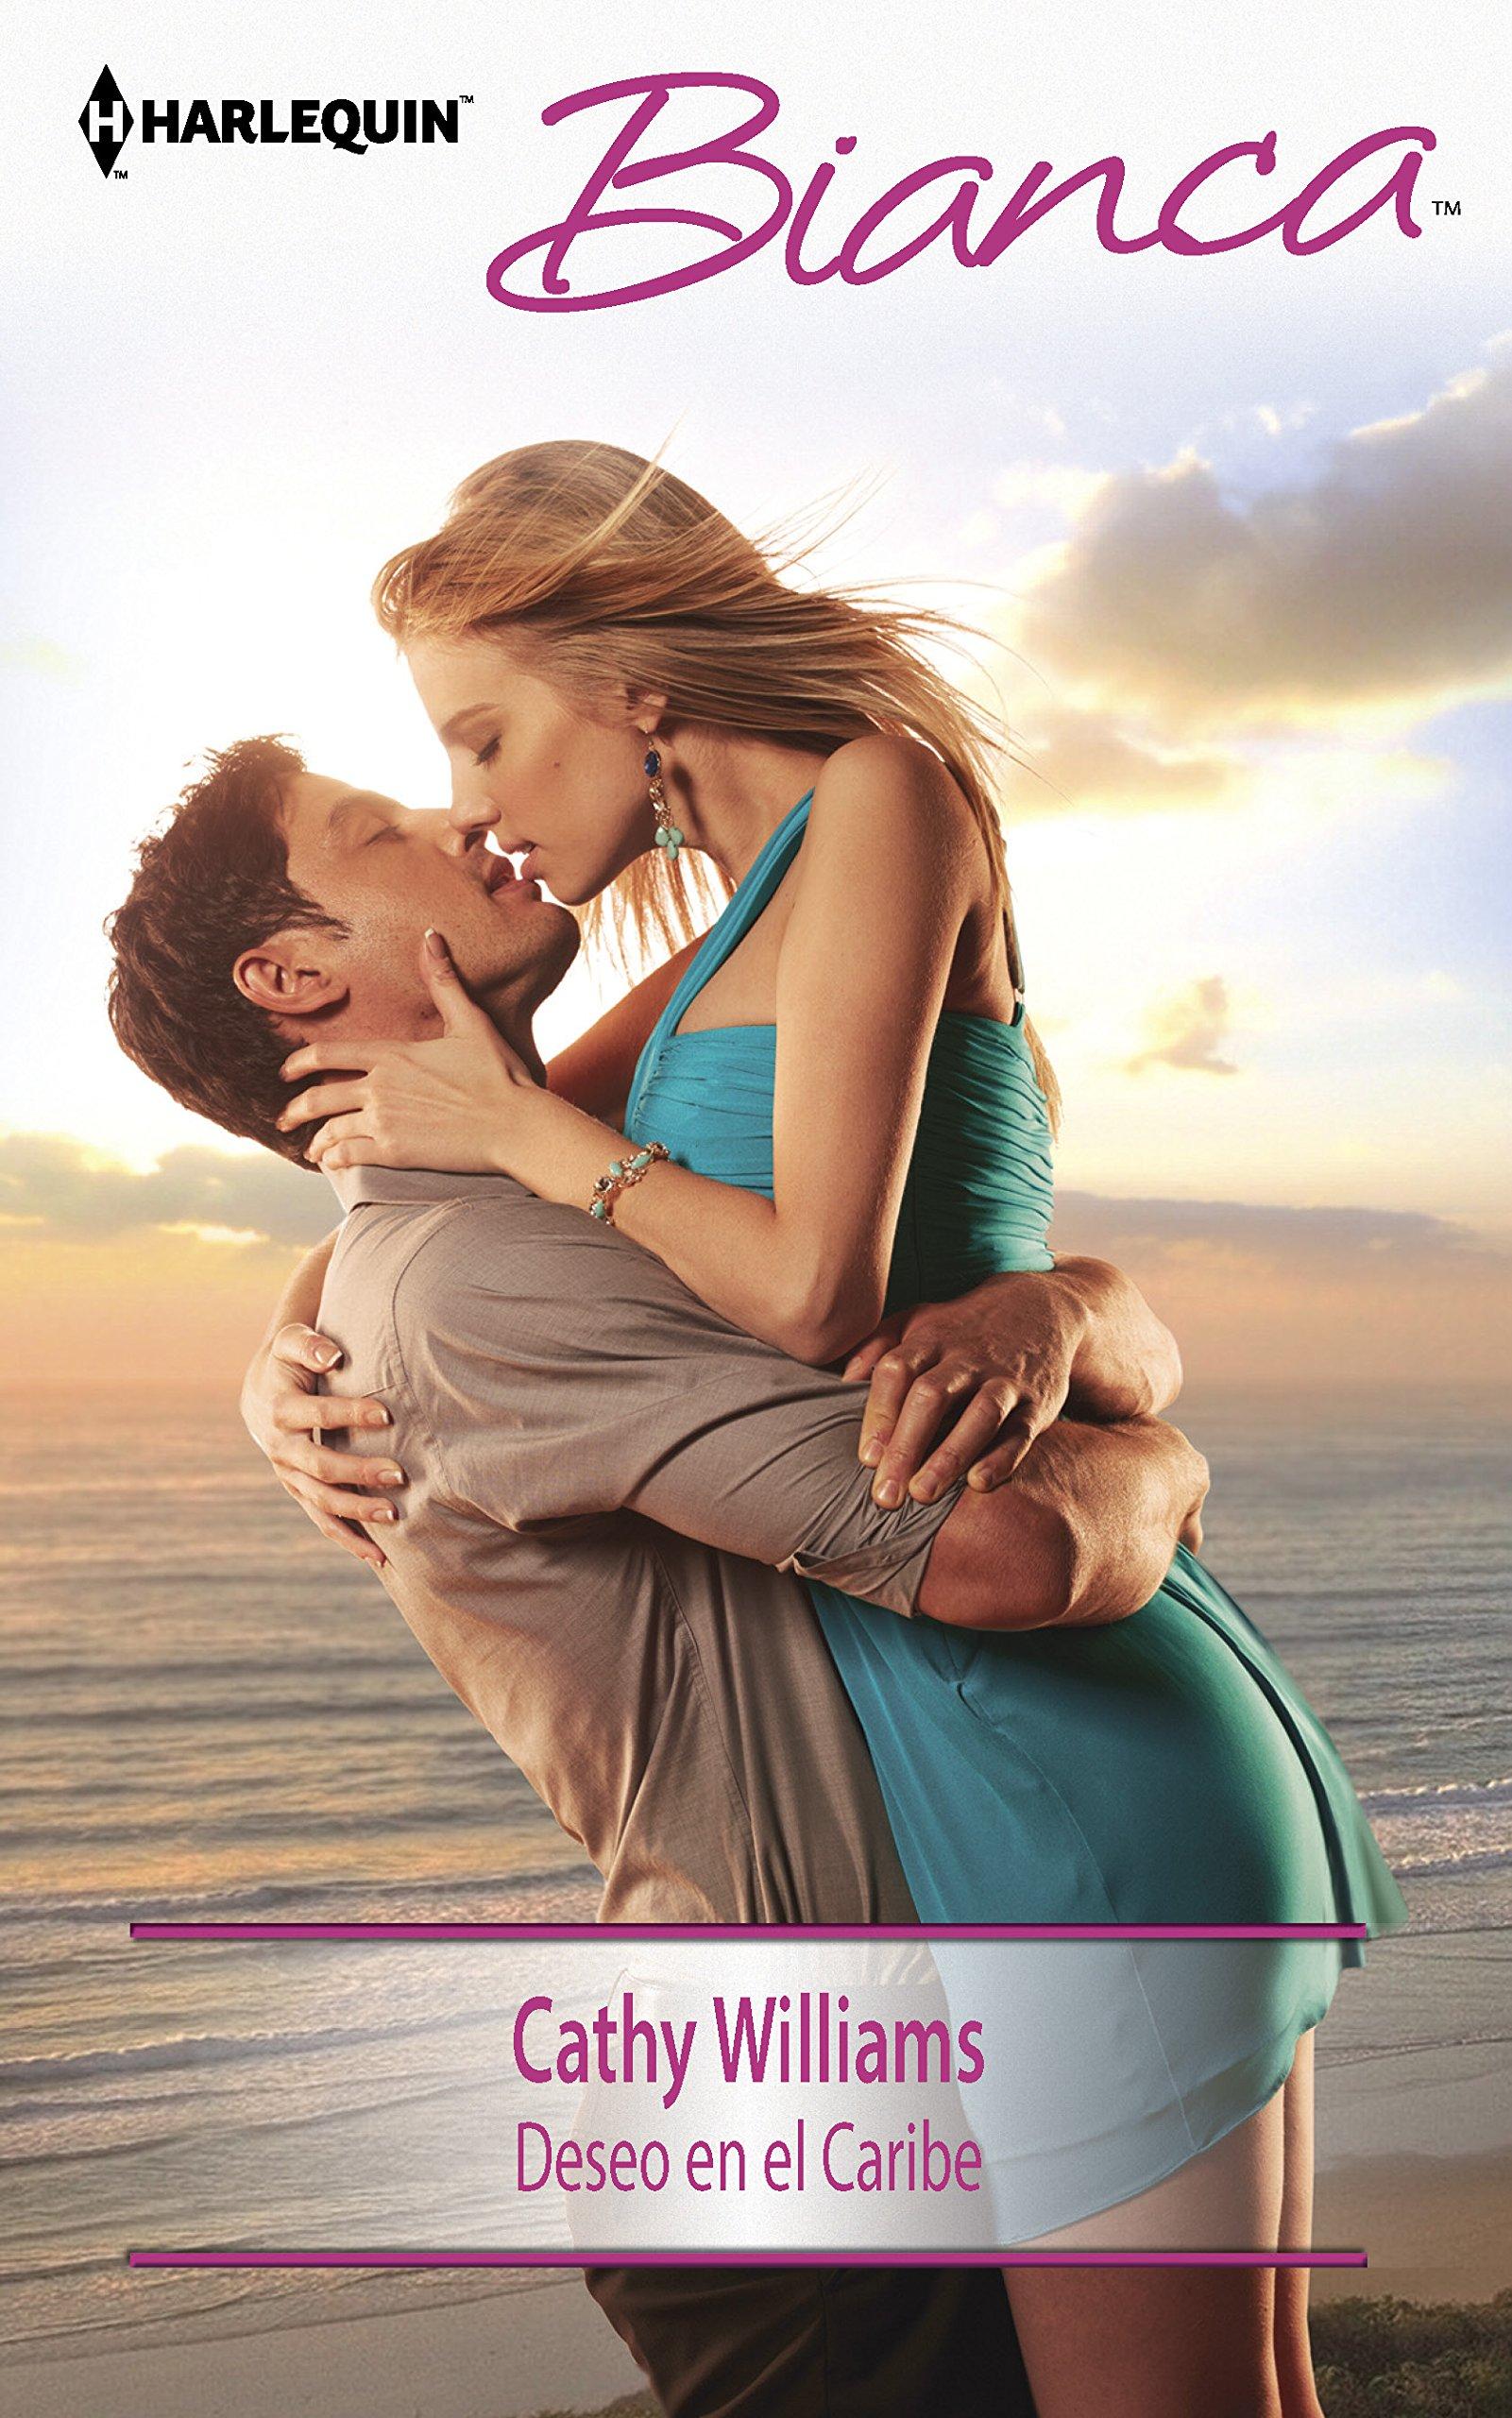 Deseo en el Caribe: (Desire in the Caribbean) (The Argentinian's Demand) (Spanish Edition) ebook